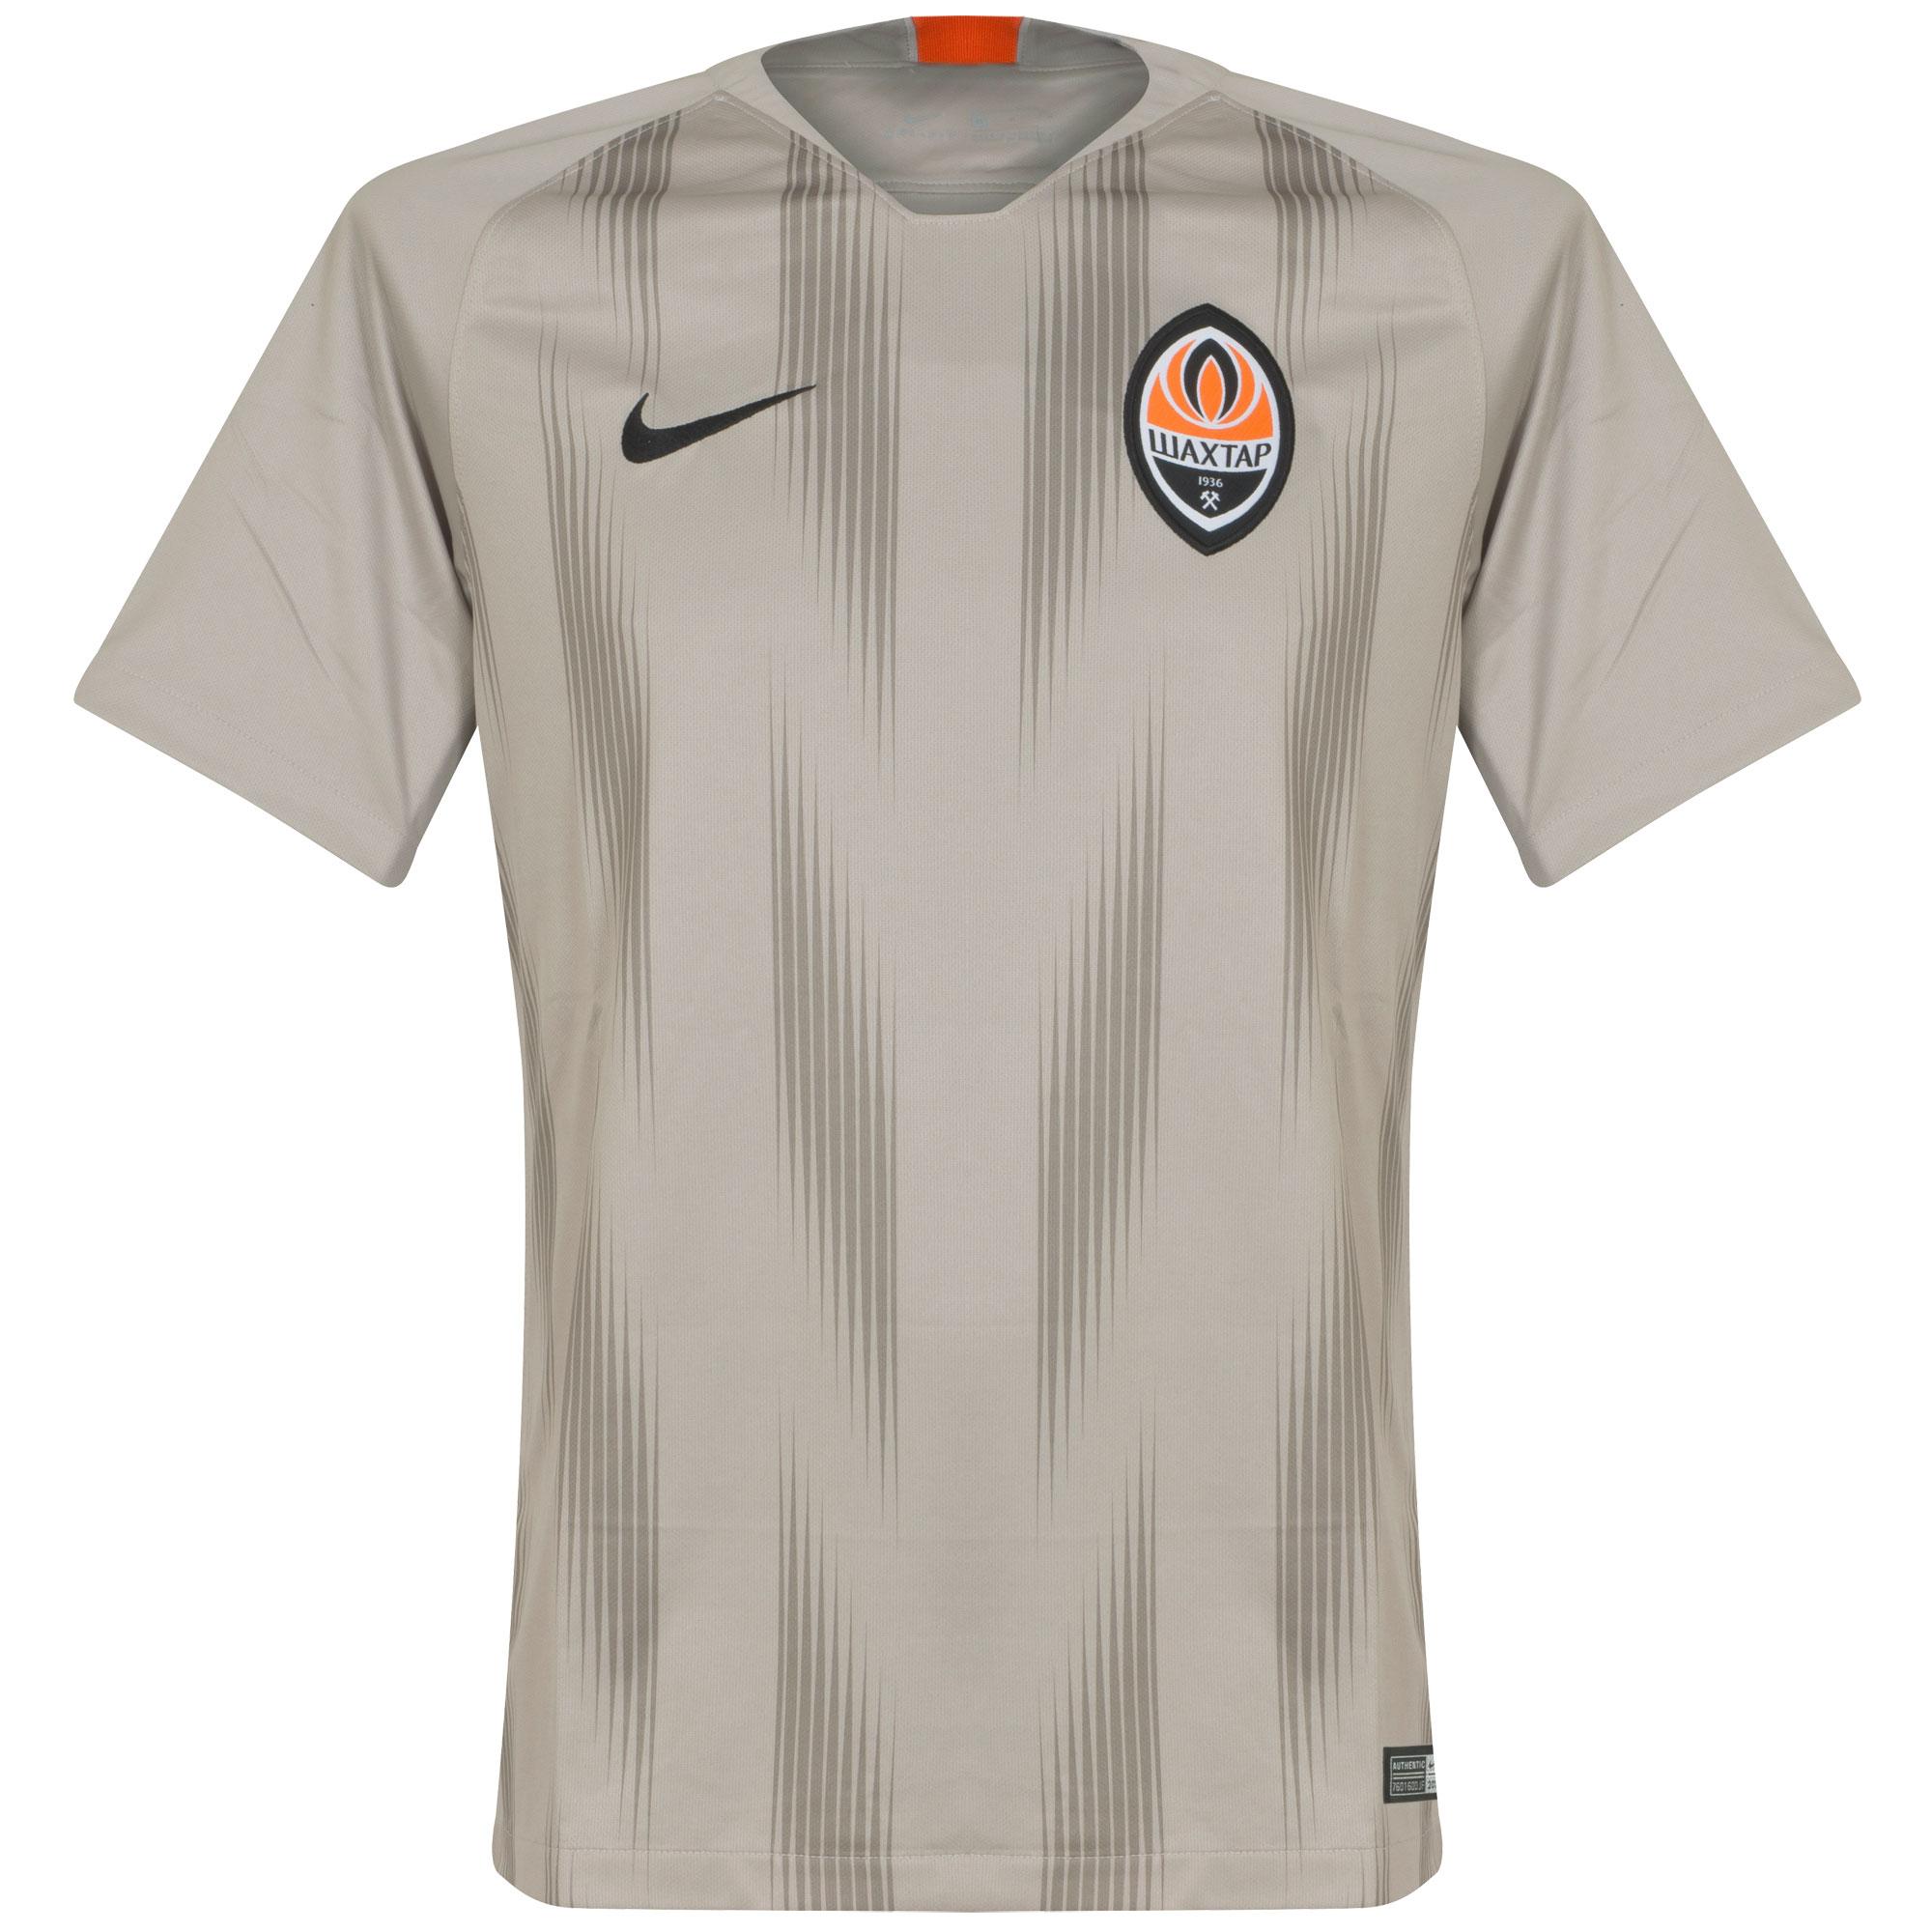 Shakhtar Donetsk Away Shirt 2018 2019